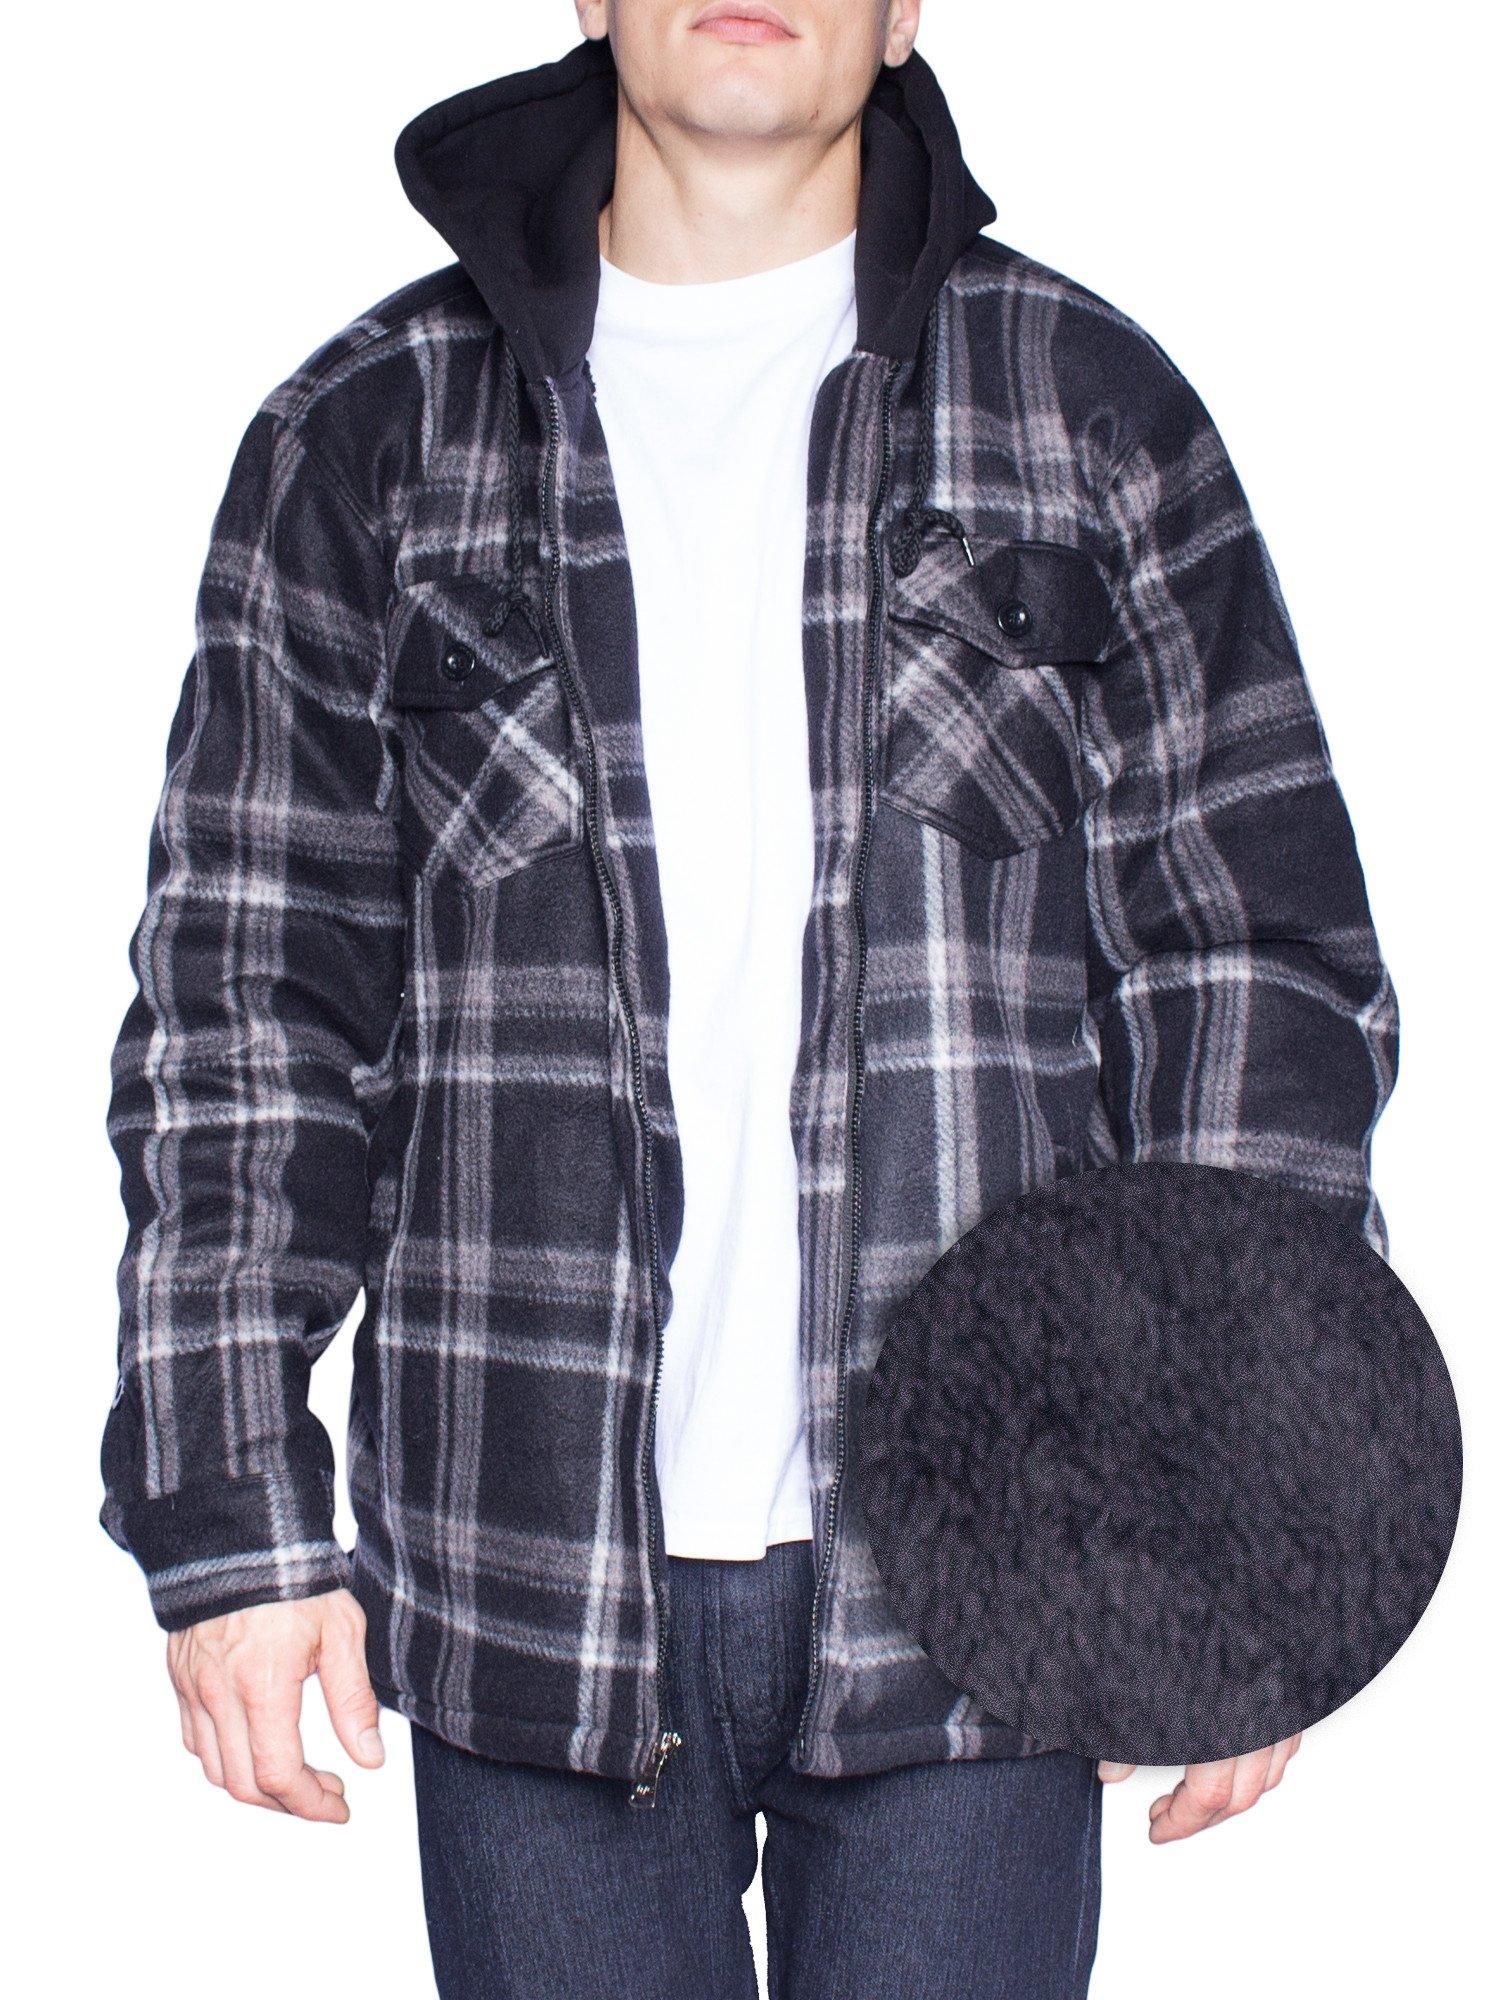 Hoodie Flannel Fleece Jacket For Men Zip Up Big & Tall Lined Sherpa Sweatshirts (3XL-Tall, Black/Grey)